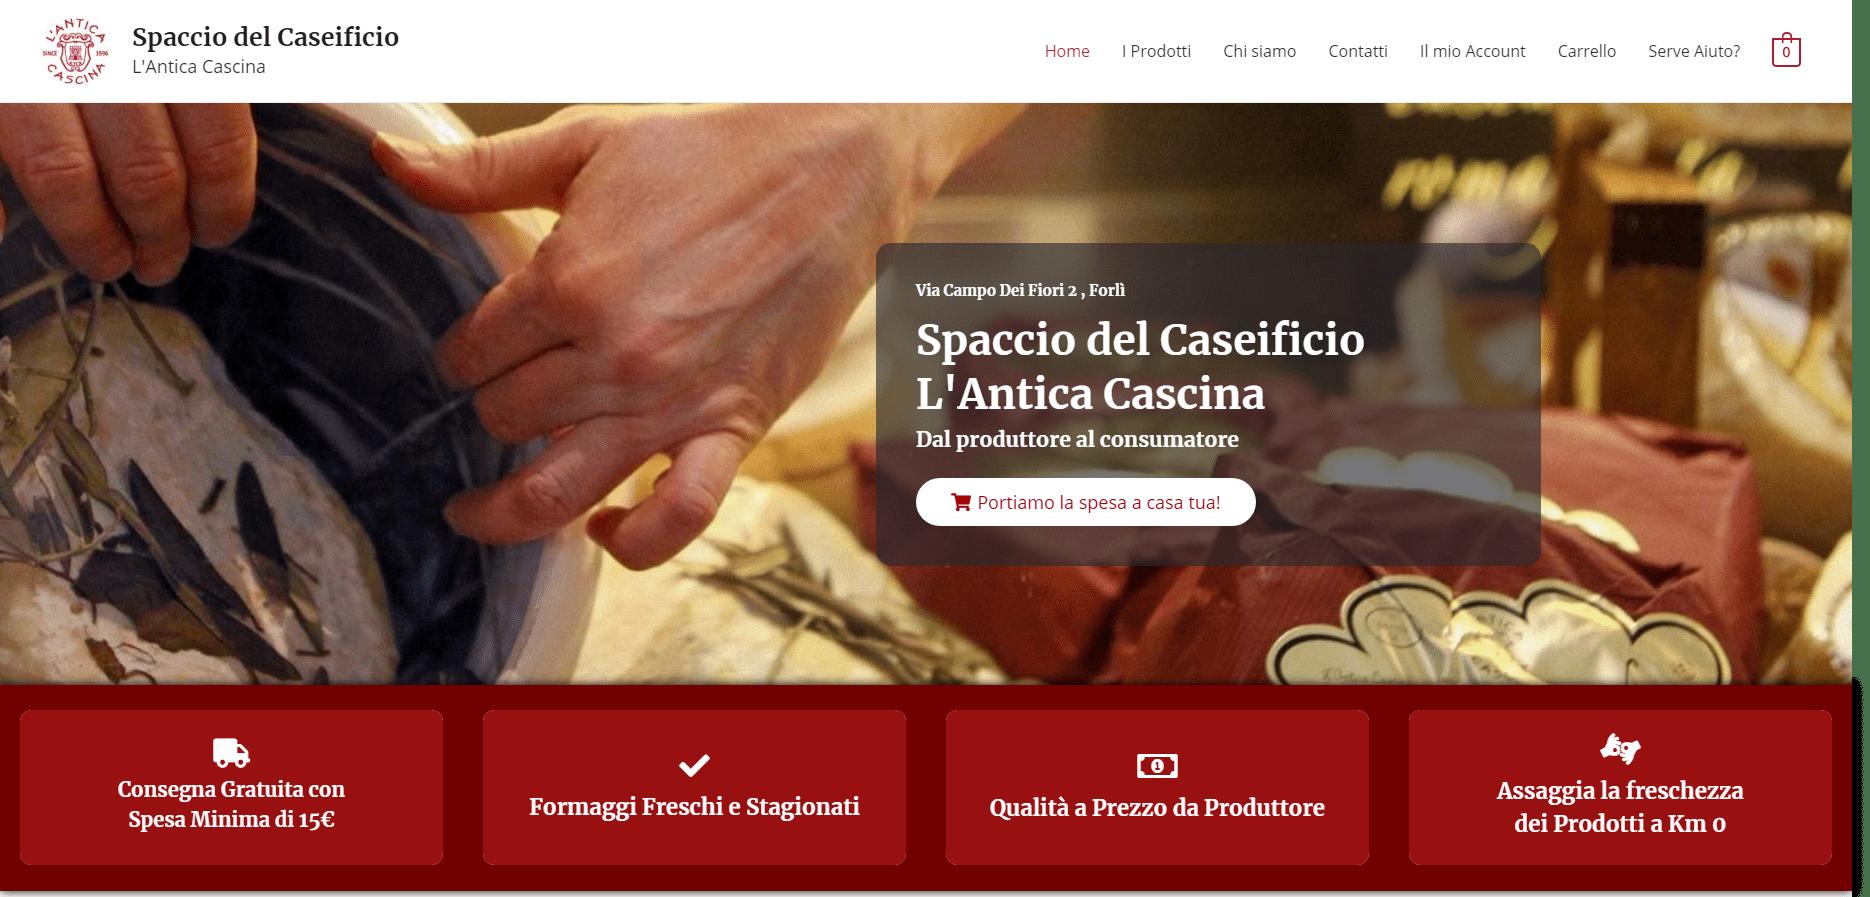 Opera Snapshot_2020-04-27_150939_www.spaccioanticacascina.it